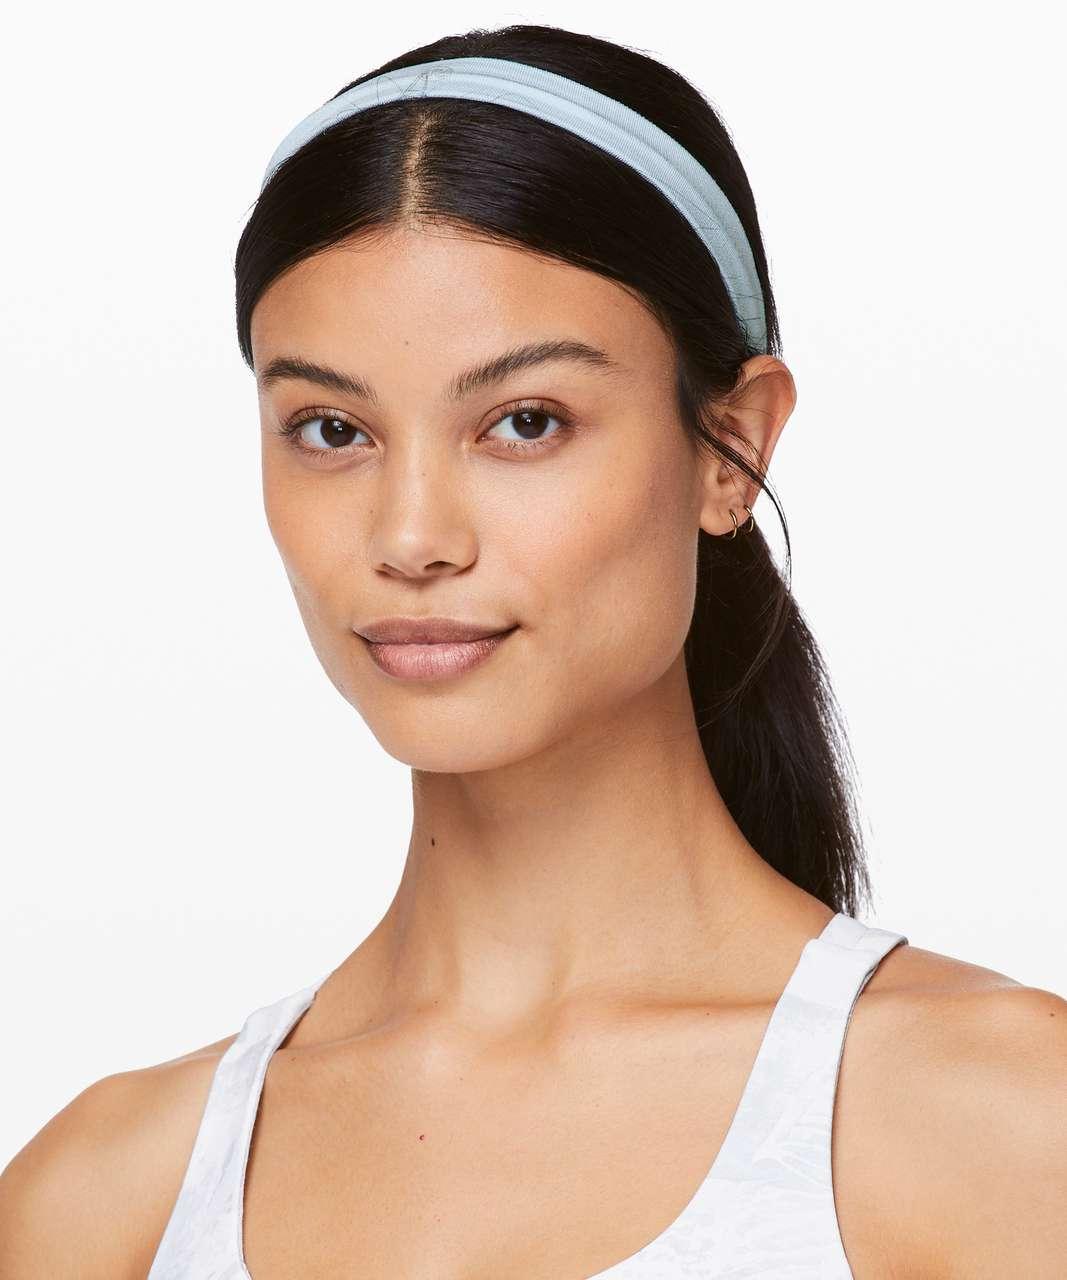 Lululemon Cardio Cross Trainer Headband - Breezy / Breezy